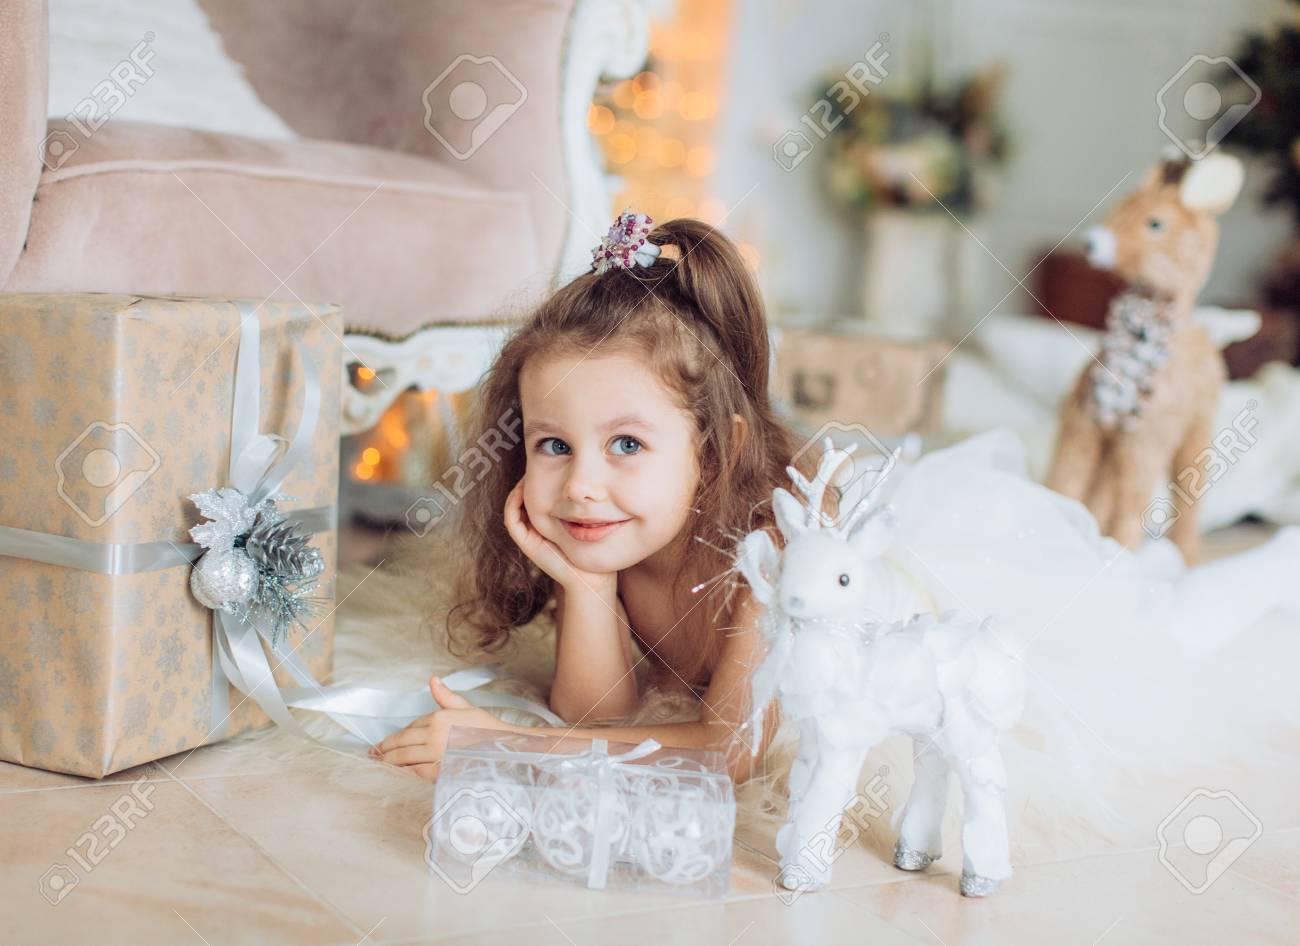 Fotografia infantil  - Página 12 87871246-beautiful-little-girl-in-white-dress-with-christmas-tree-decoration